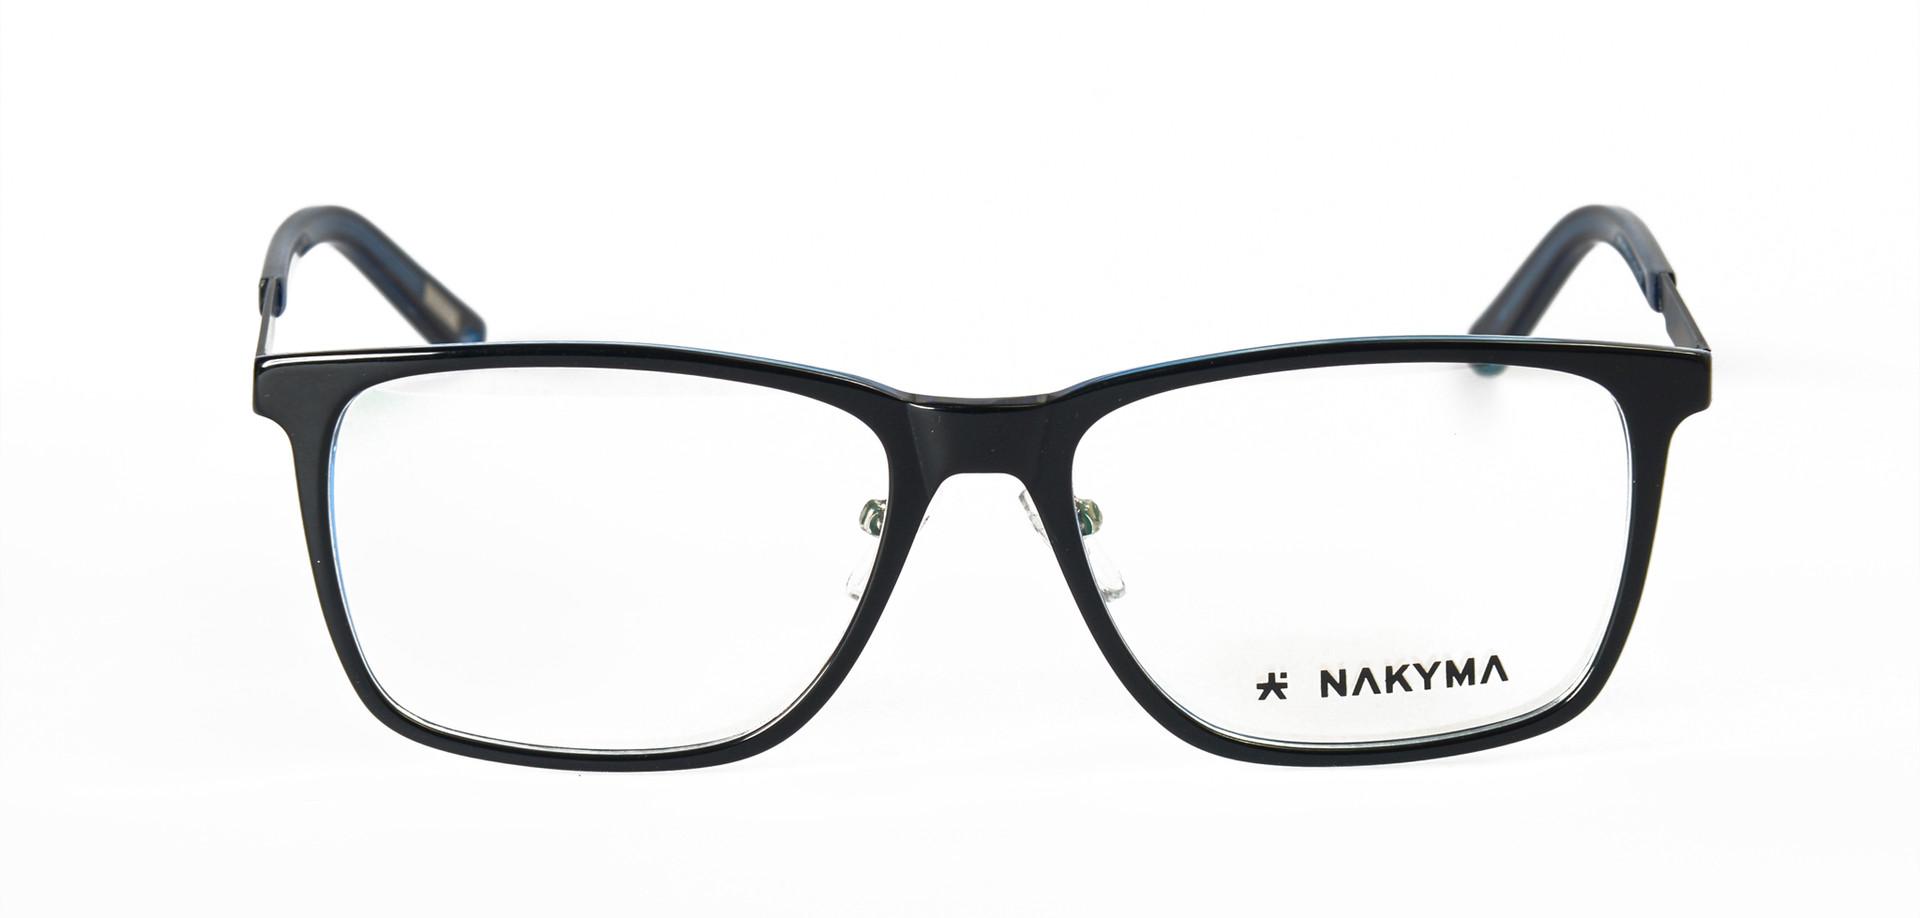 8R1-NAKYMA-02 C2